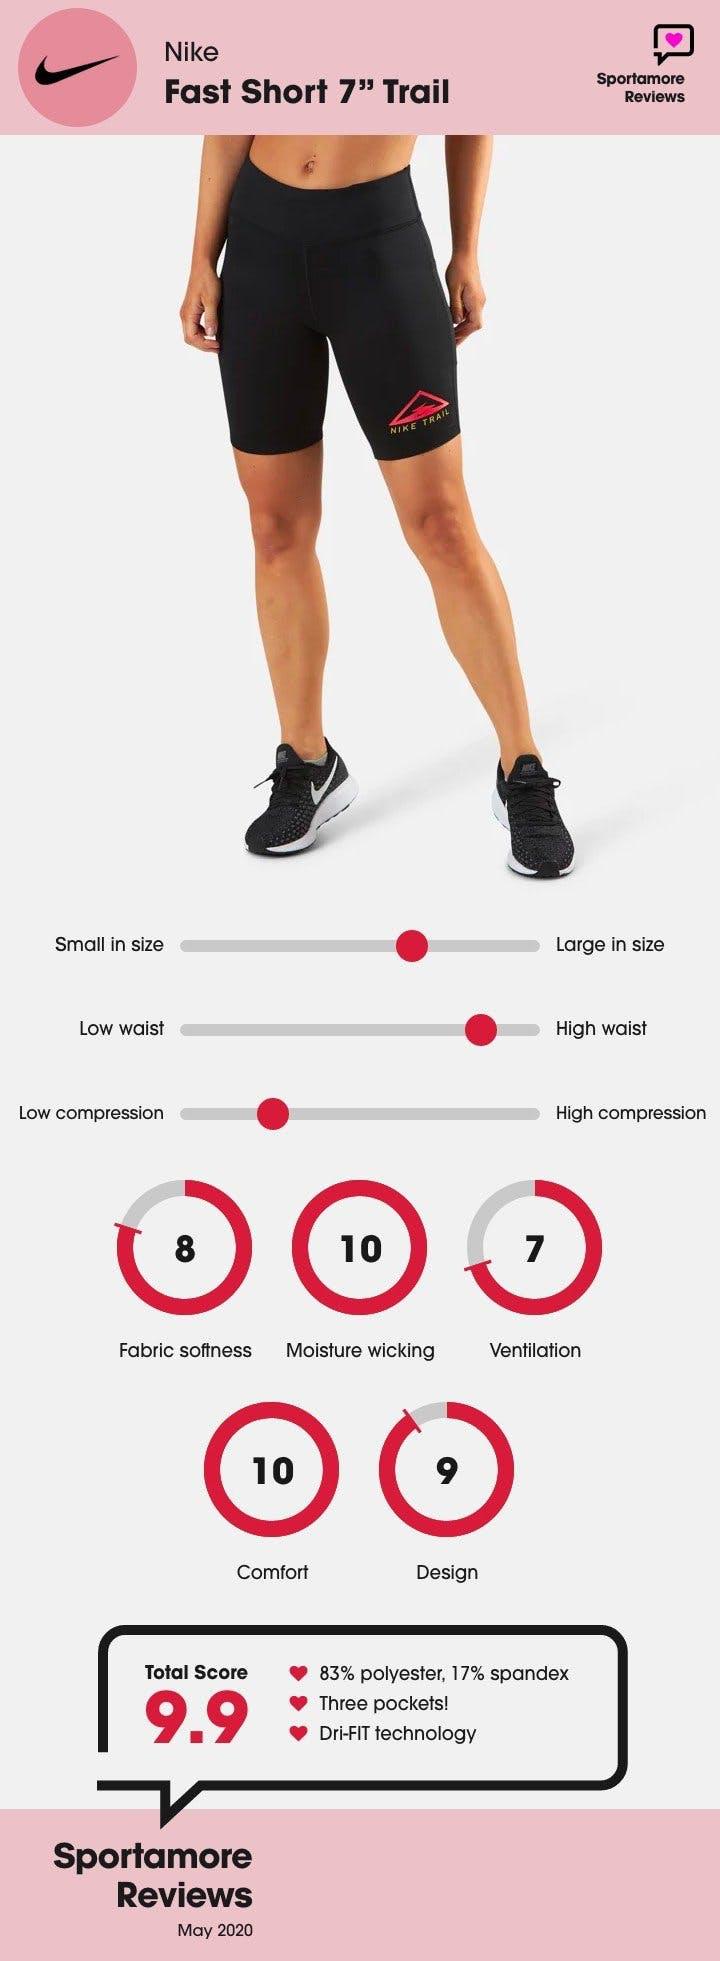 "Nike Fast Short 7"" Trail.jpg"